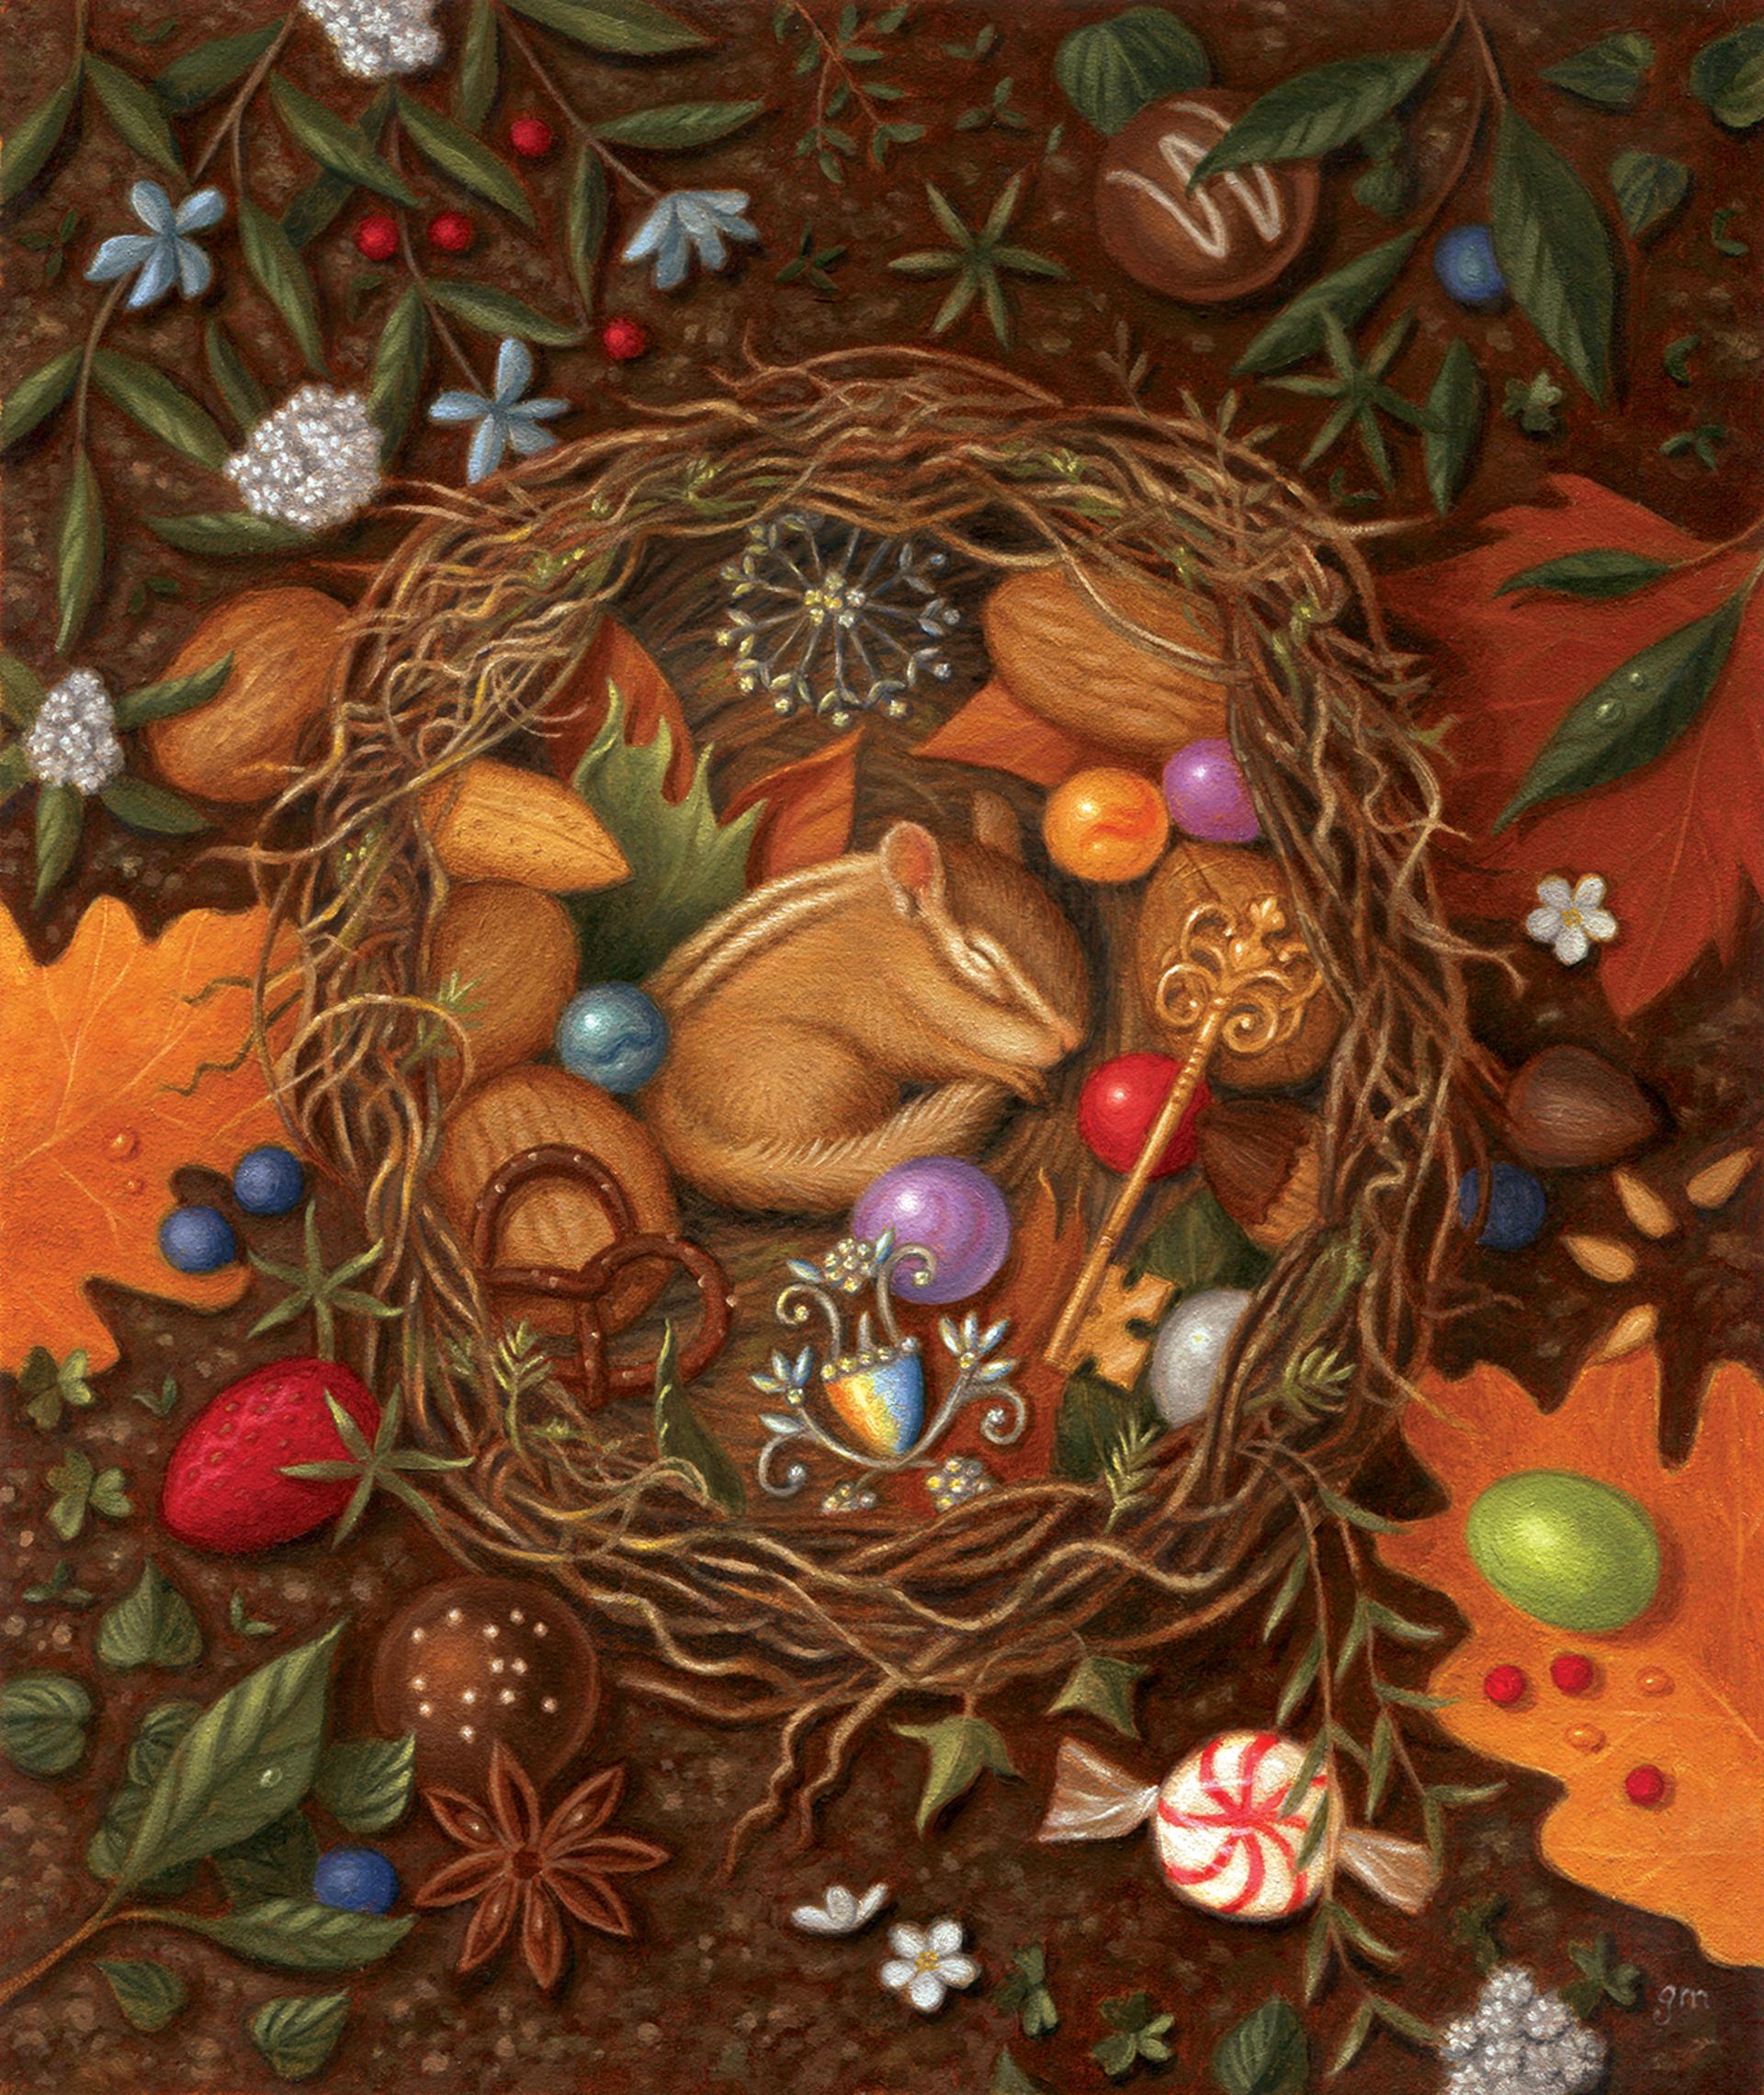 The Collector by Gina Matarazzo